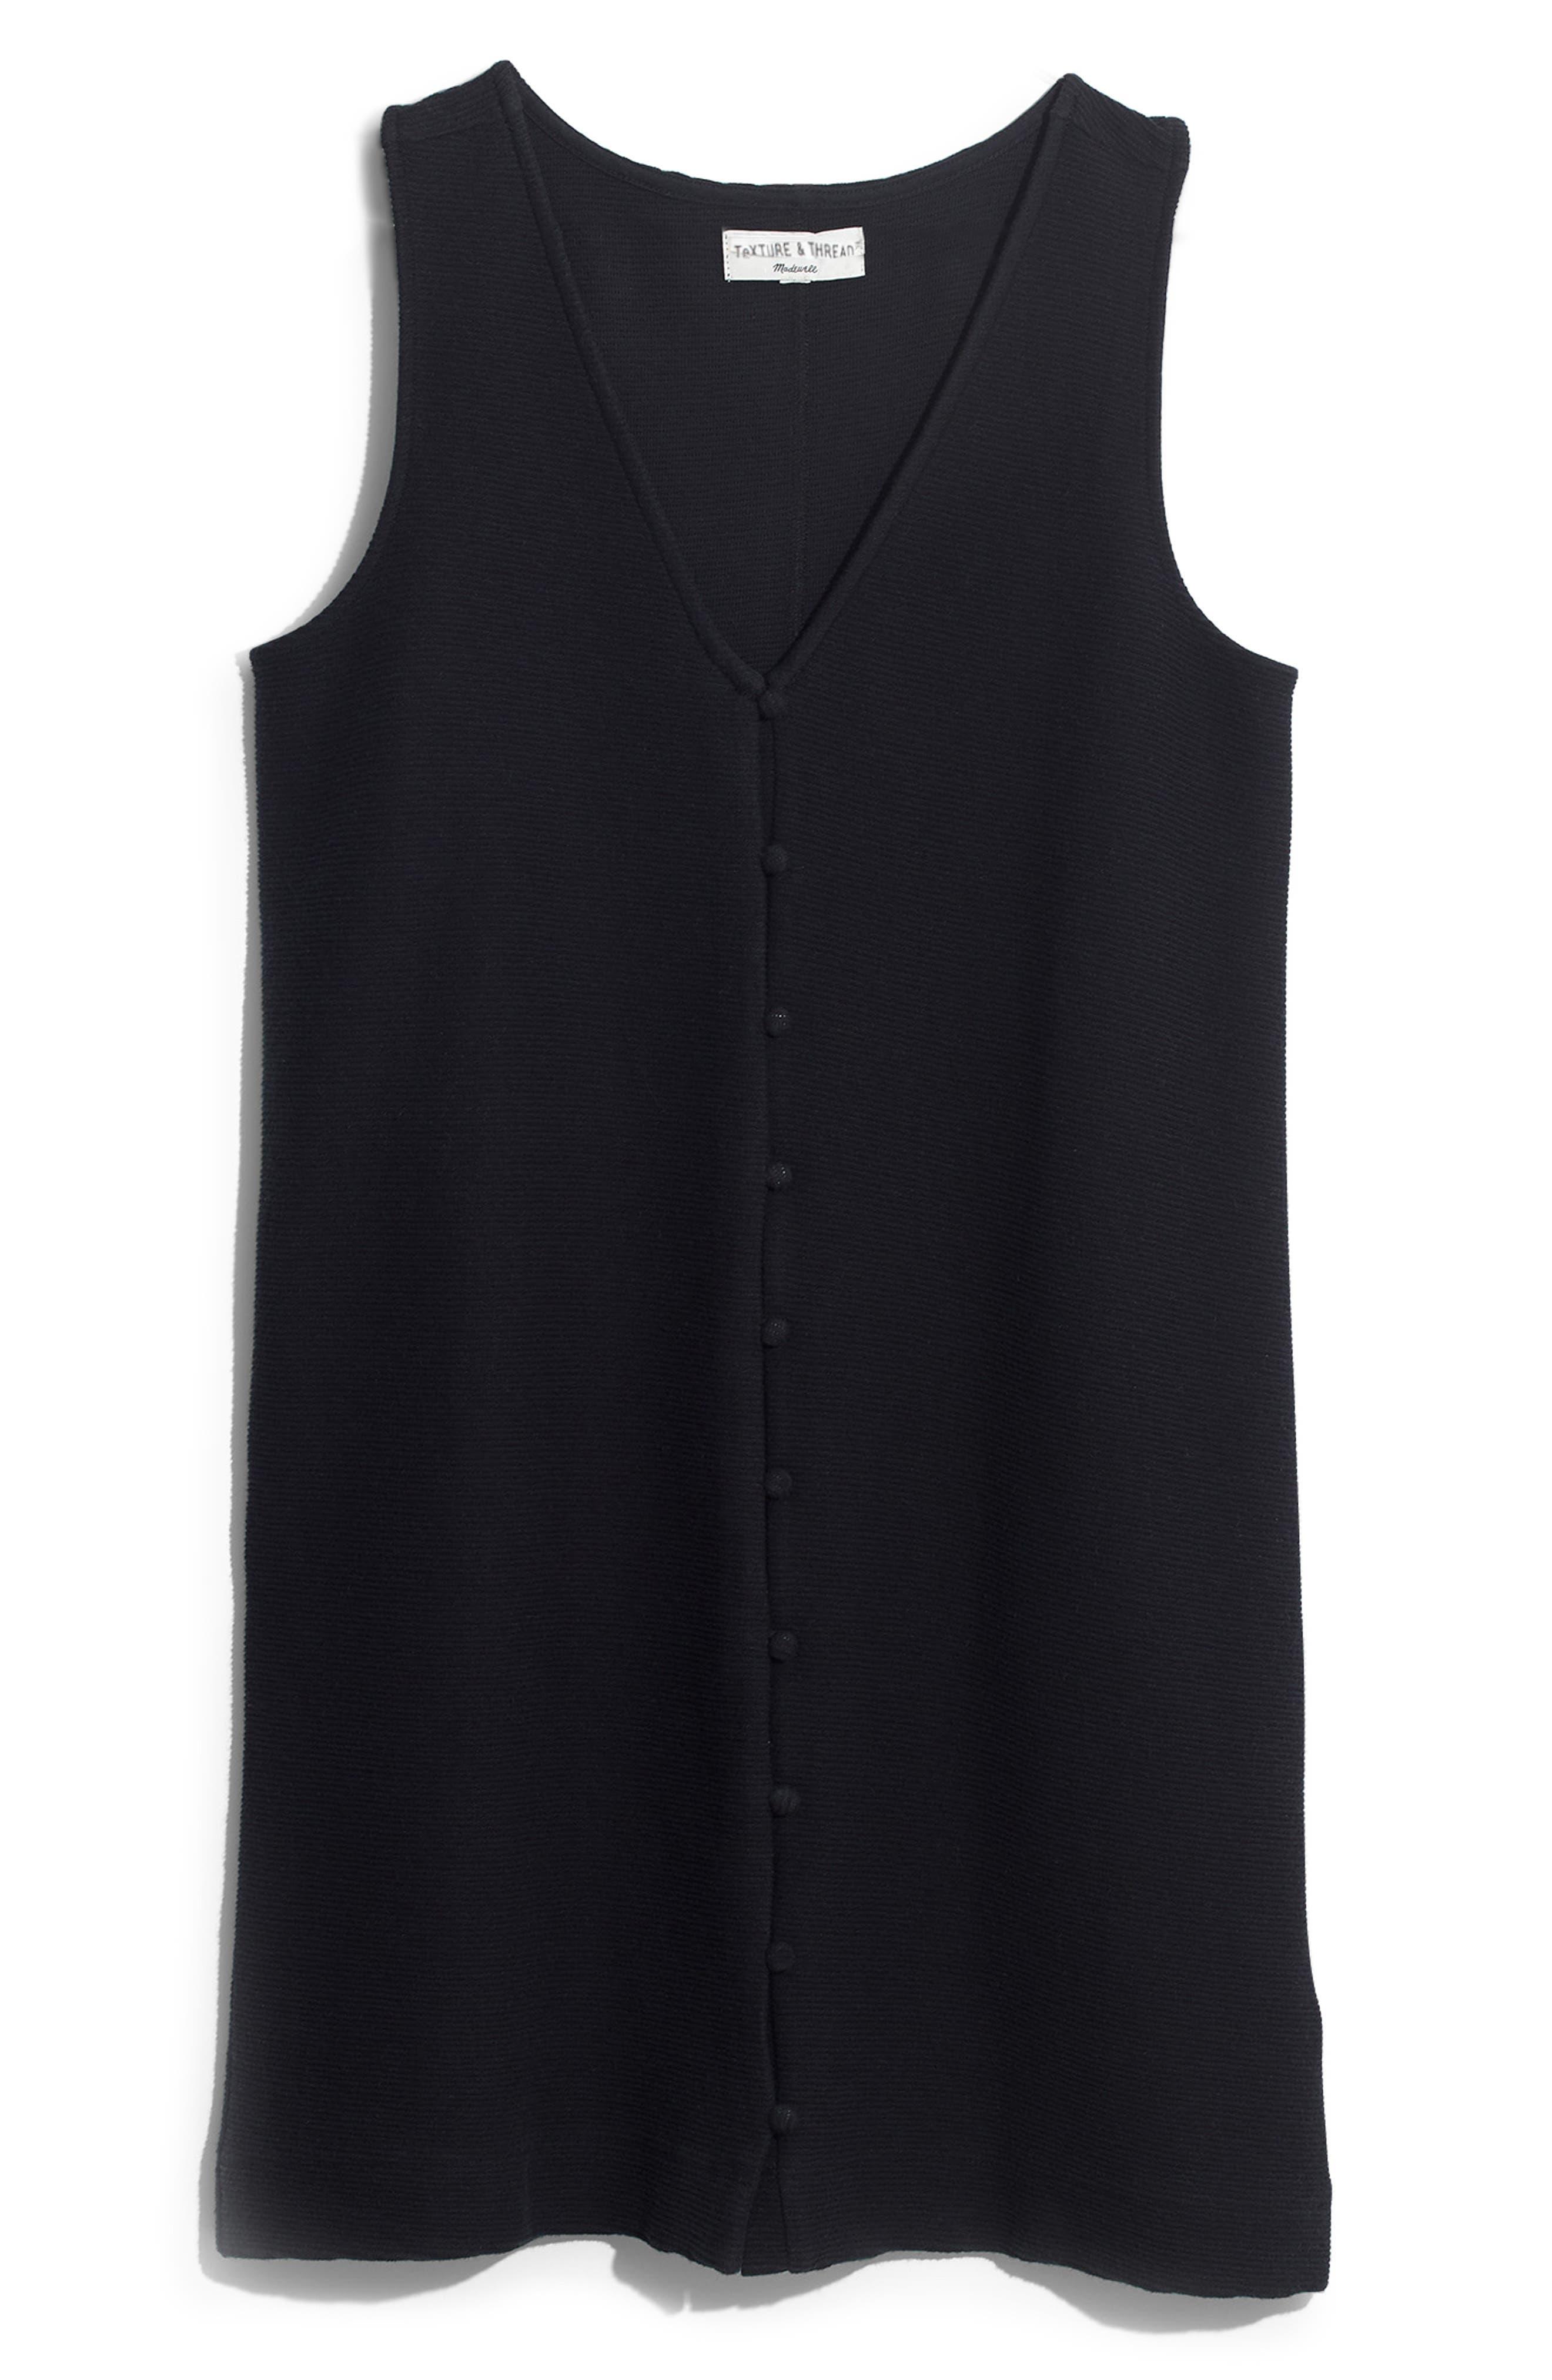 Madewell Texture & Thread Button Front Tank Dress, Black